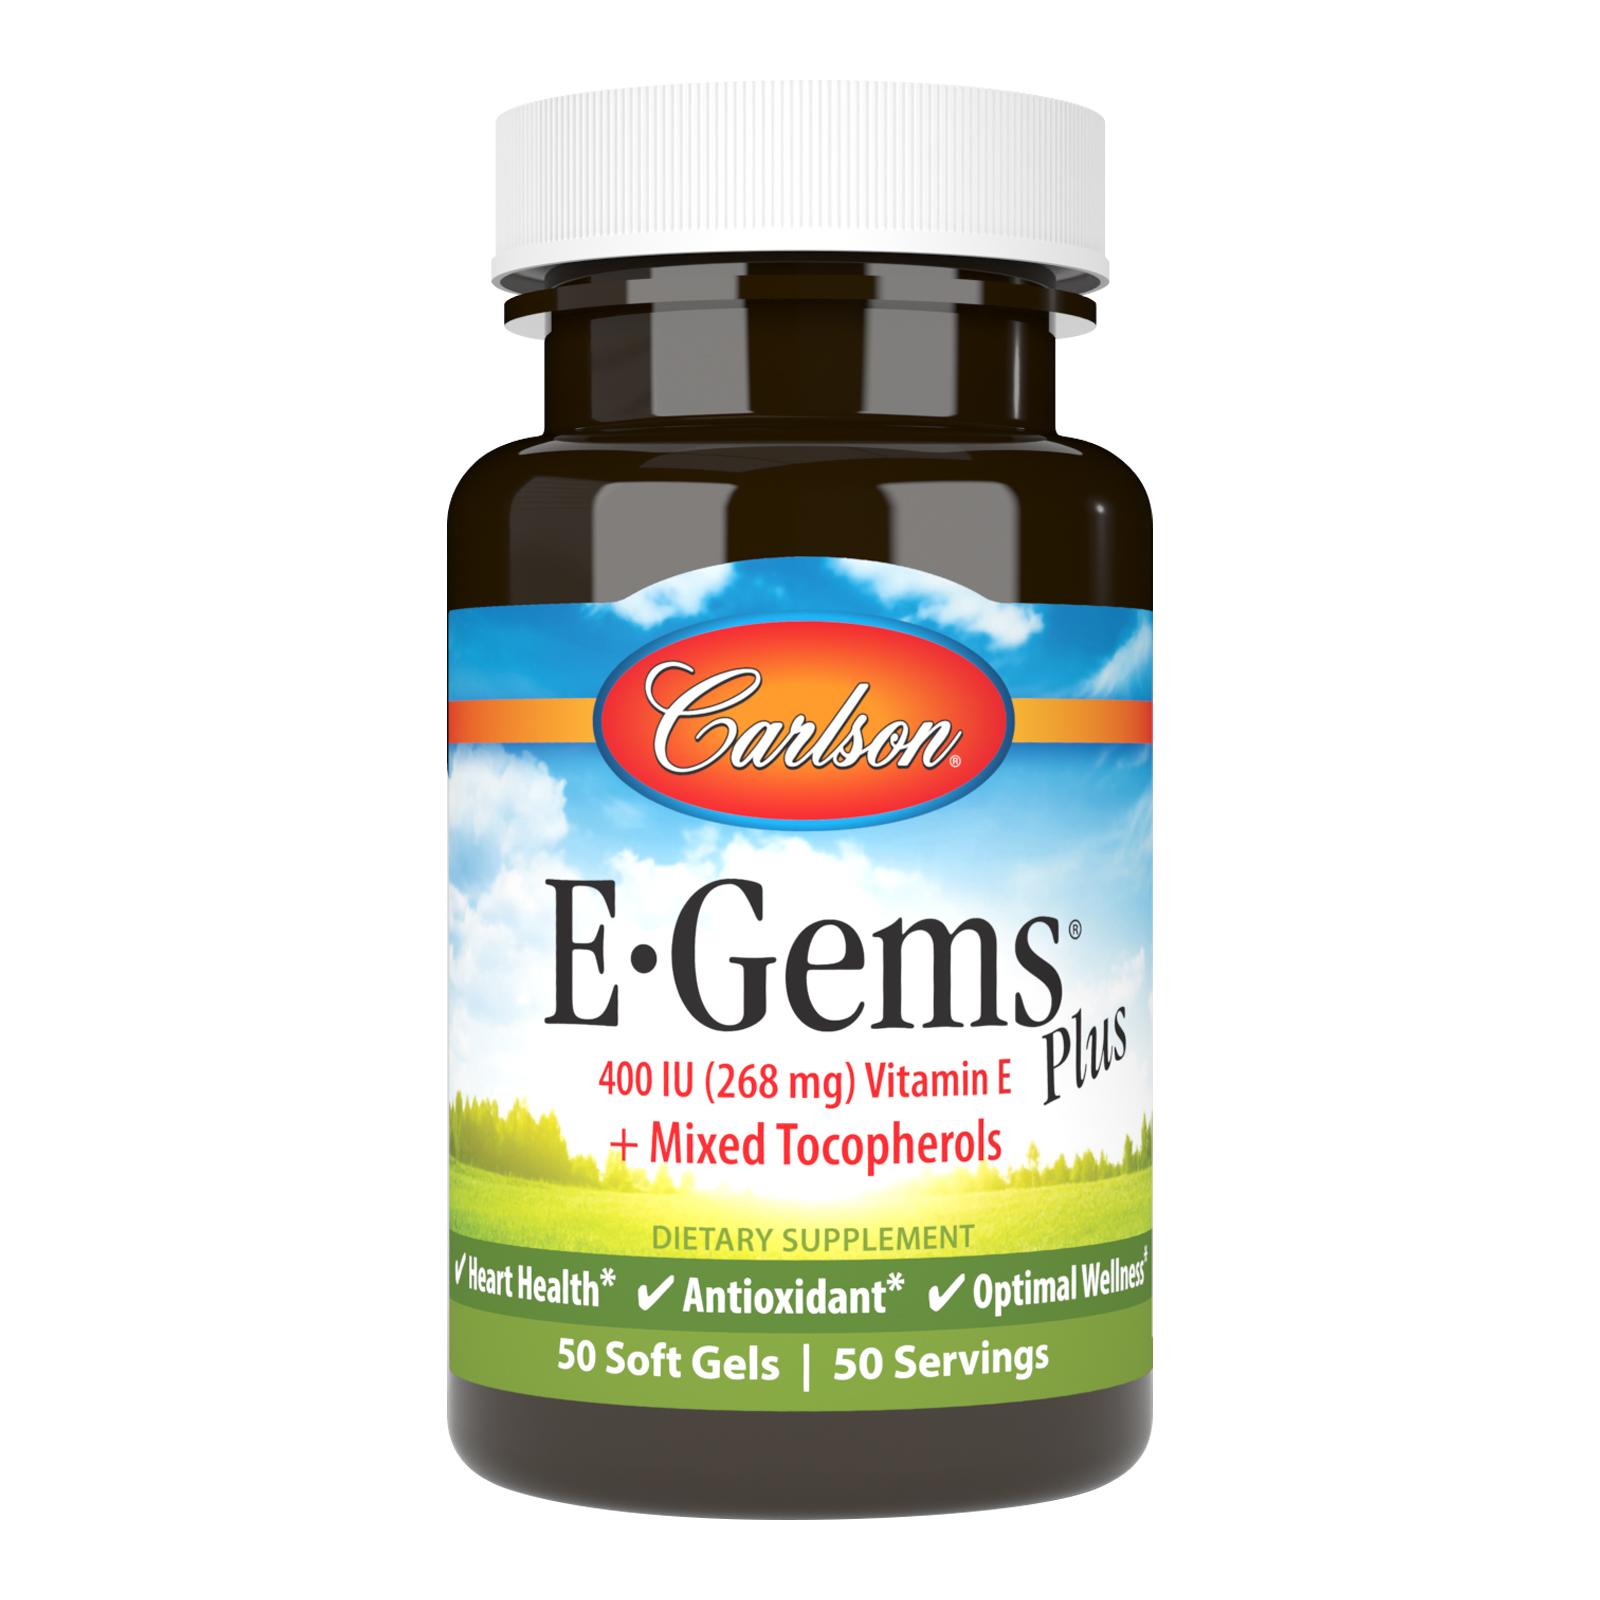 E-Gems® Plus 400 IU (268 mg)